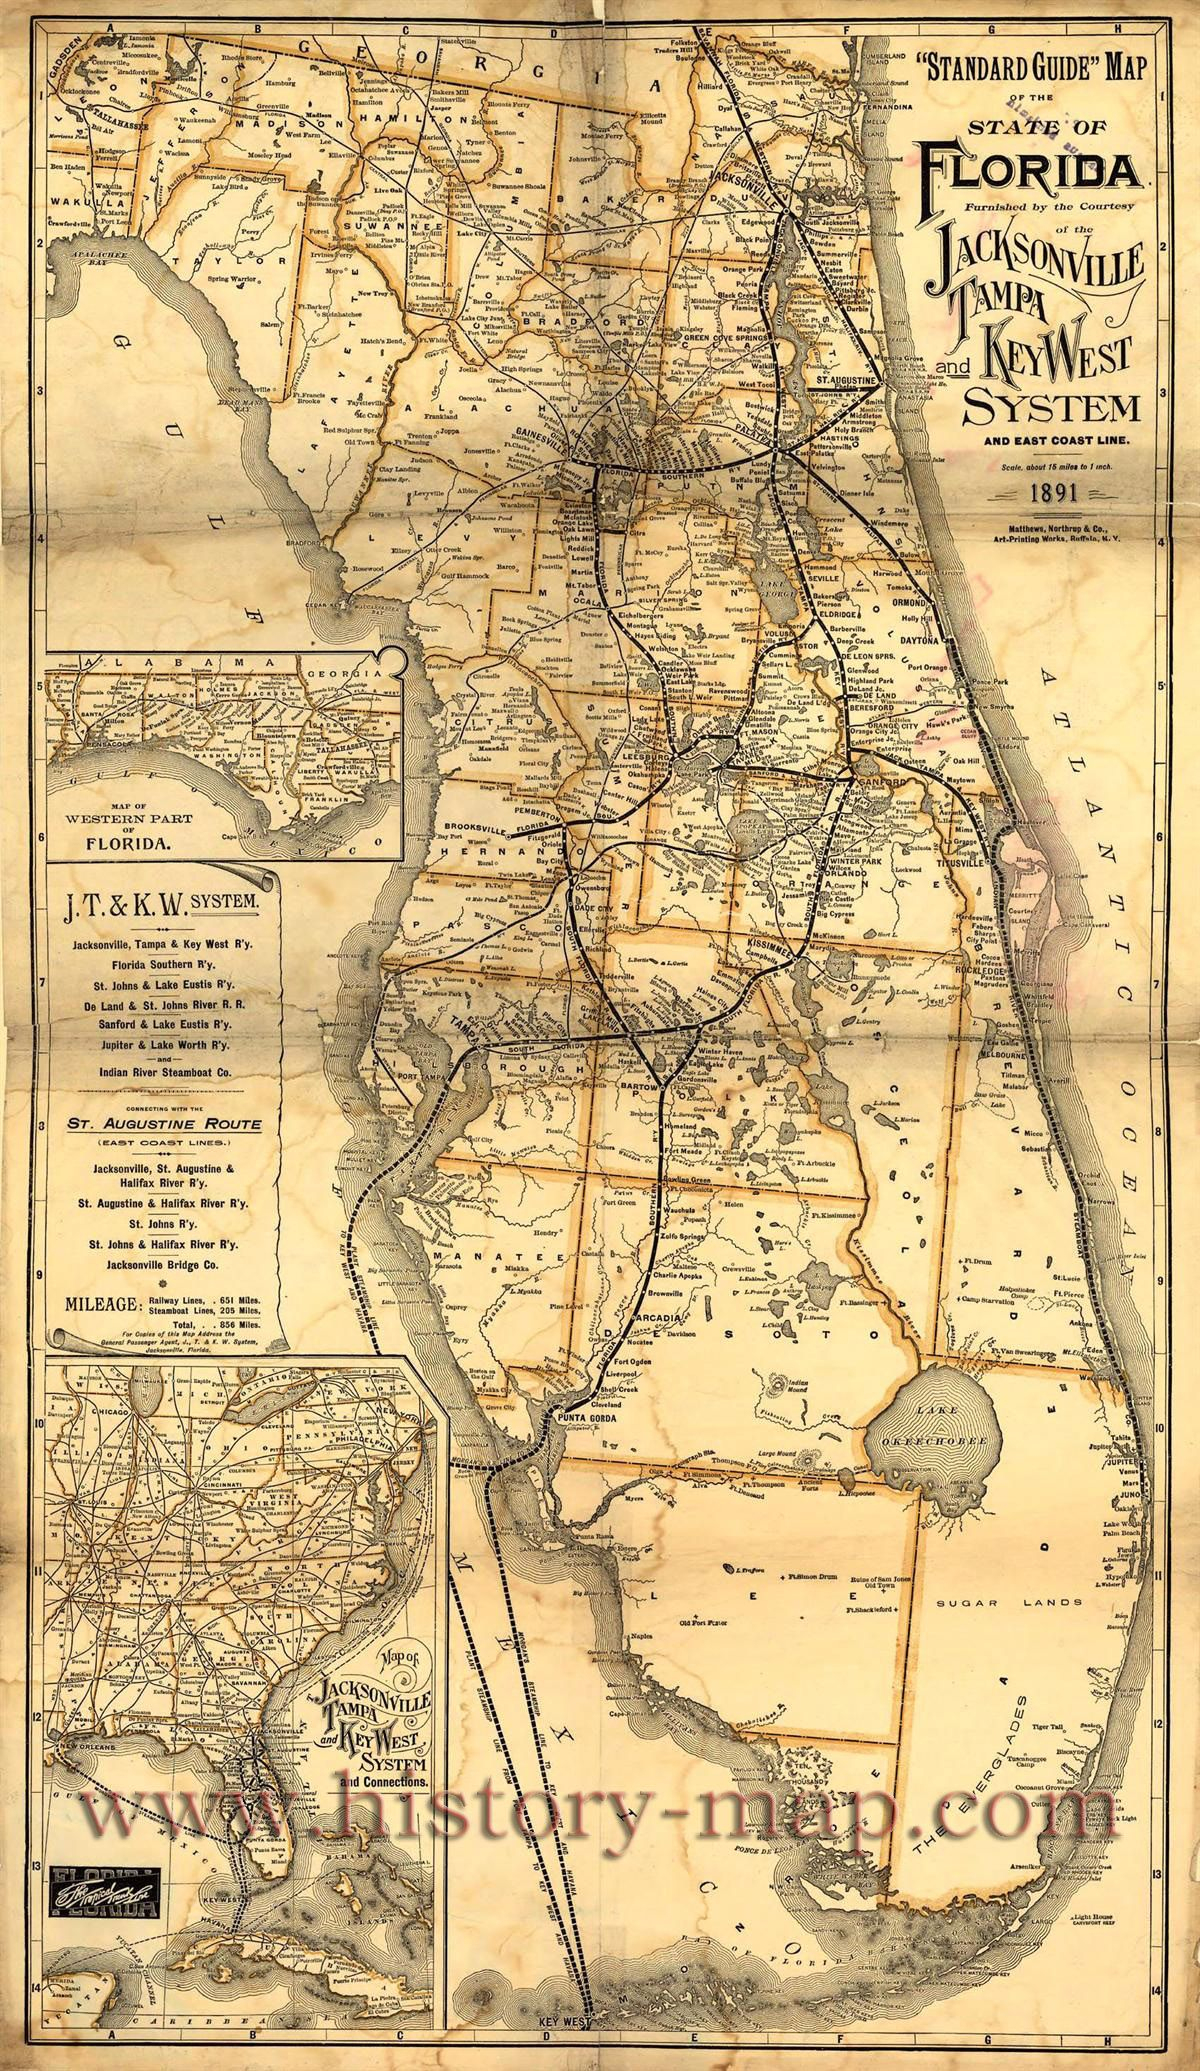 Florida | Florida In 2019 | Pinterest | Vintage Florida, Old Florida - Vintage Florida Maps For Sale